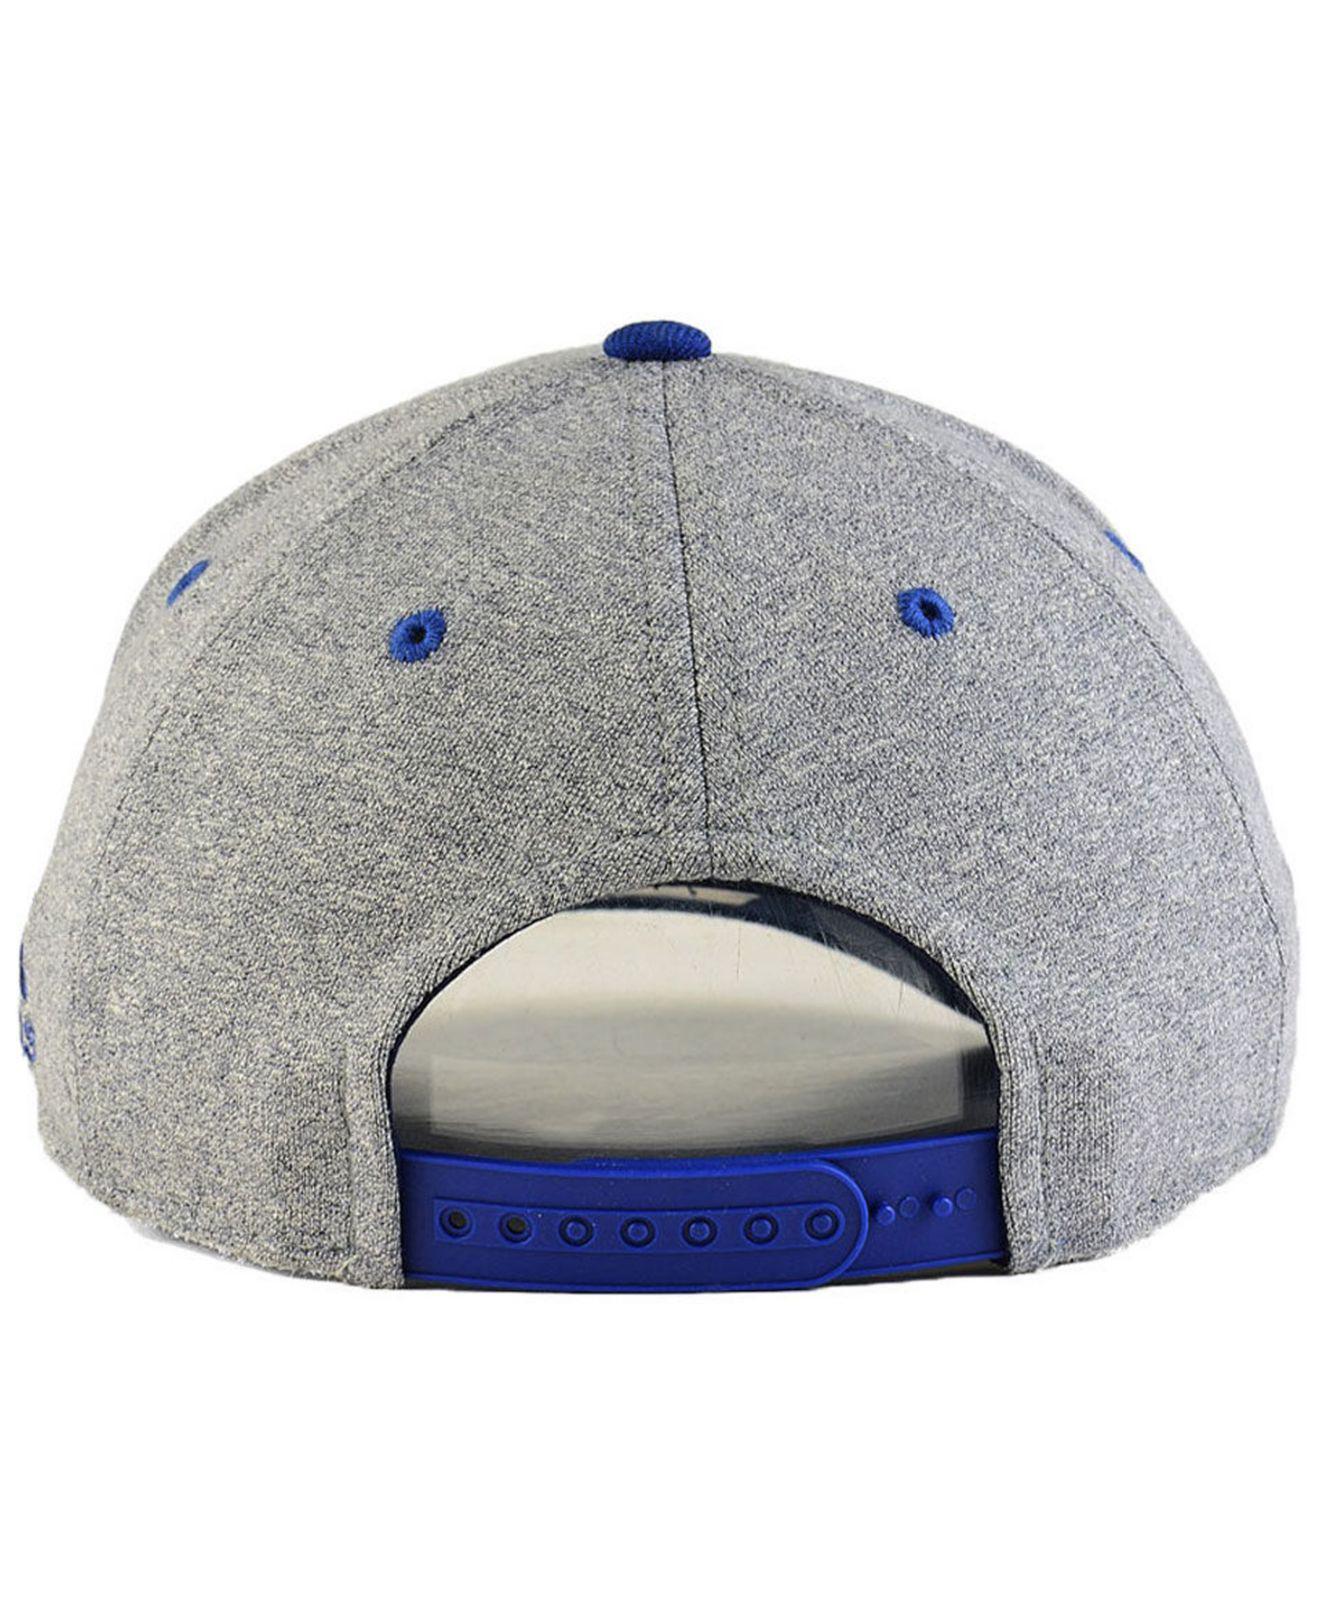 86fb7e9e7bc20 ... inexpensive adidas blue vancouver canucks heather line change cap for men  lyst. view fullscreen 1687e